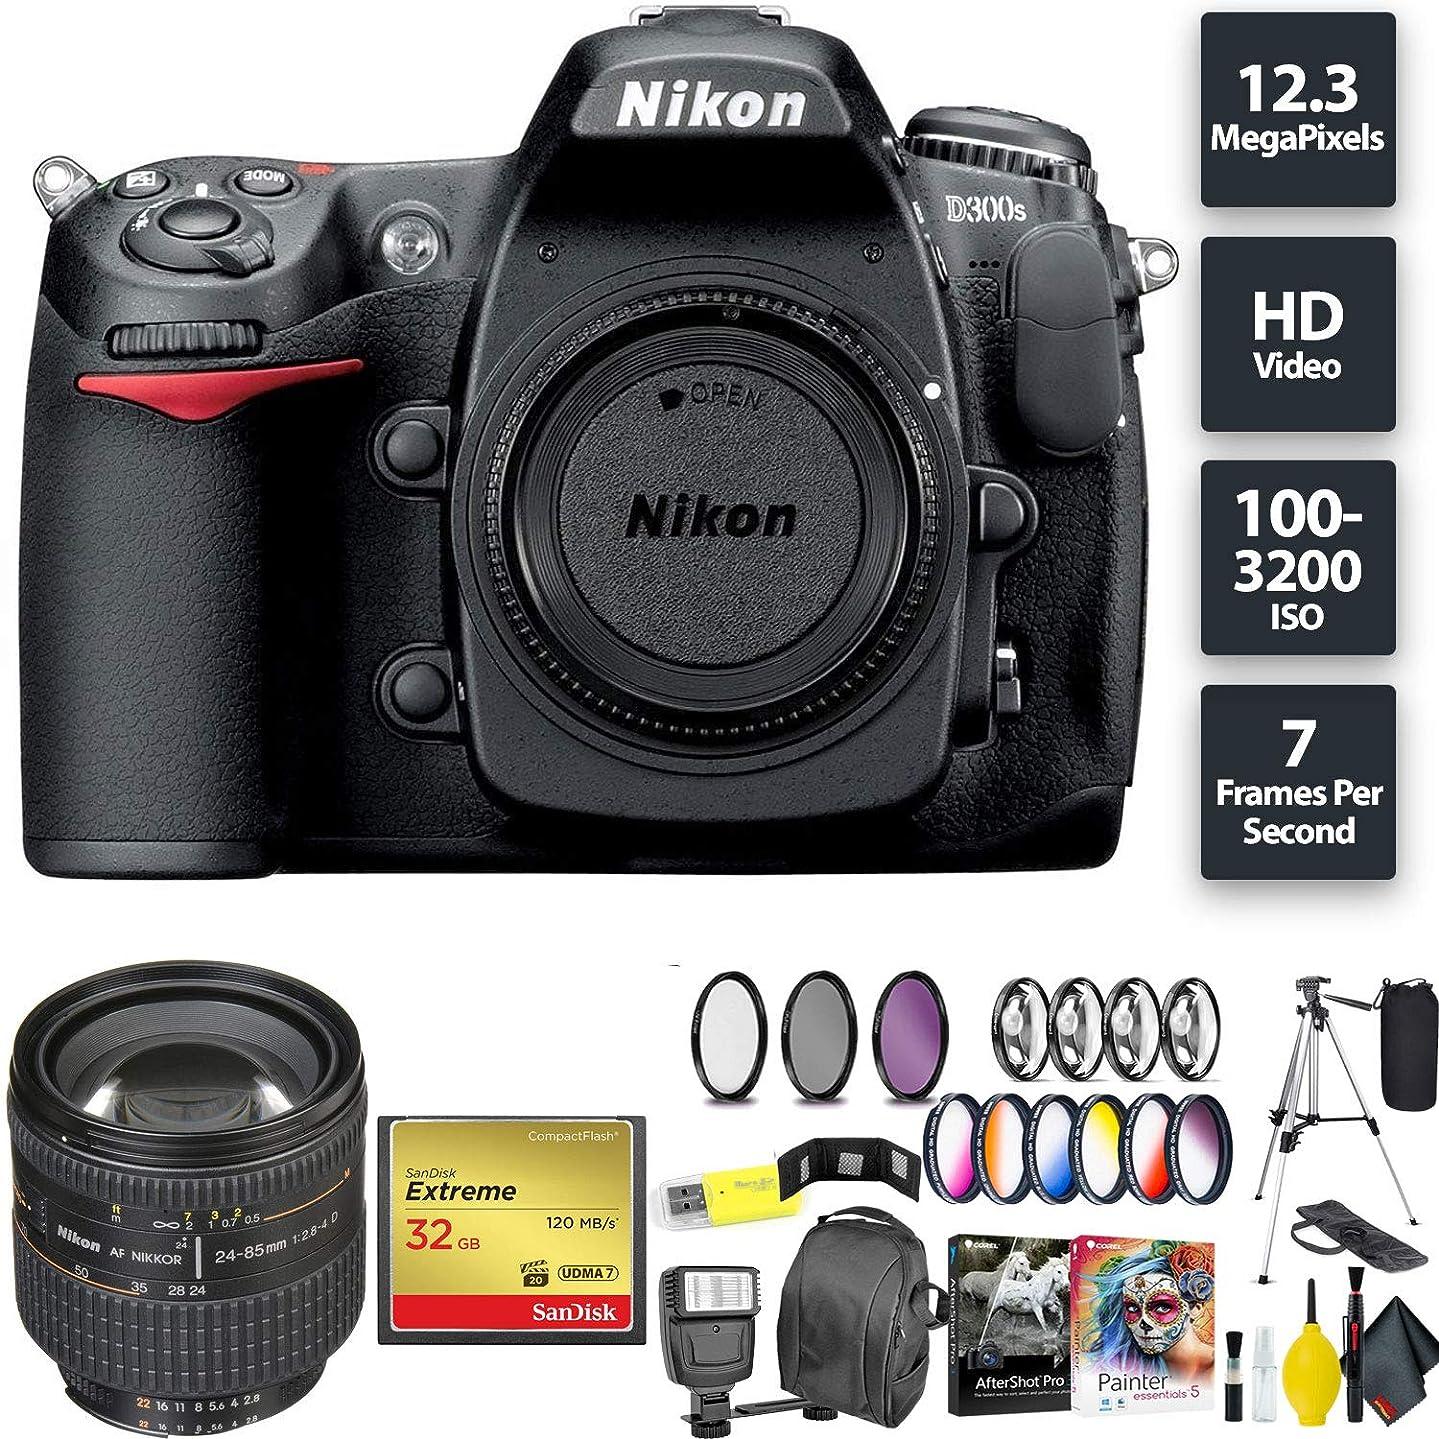 Nikon D300S DSLR Camera (Body Only) + 32GB Memory Card + Nikon 24-85mm Lens Zoom Combo International Model